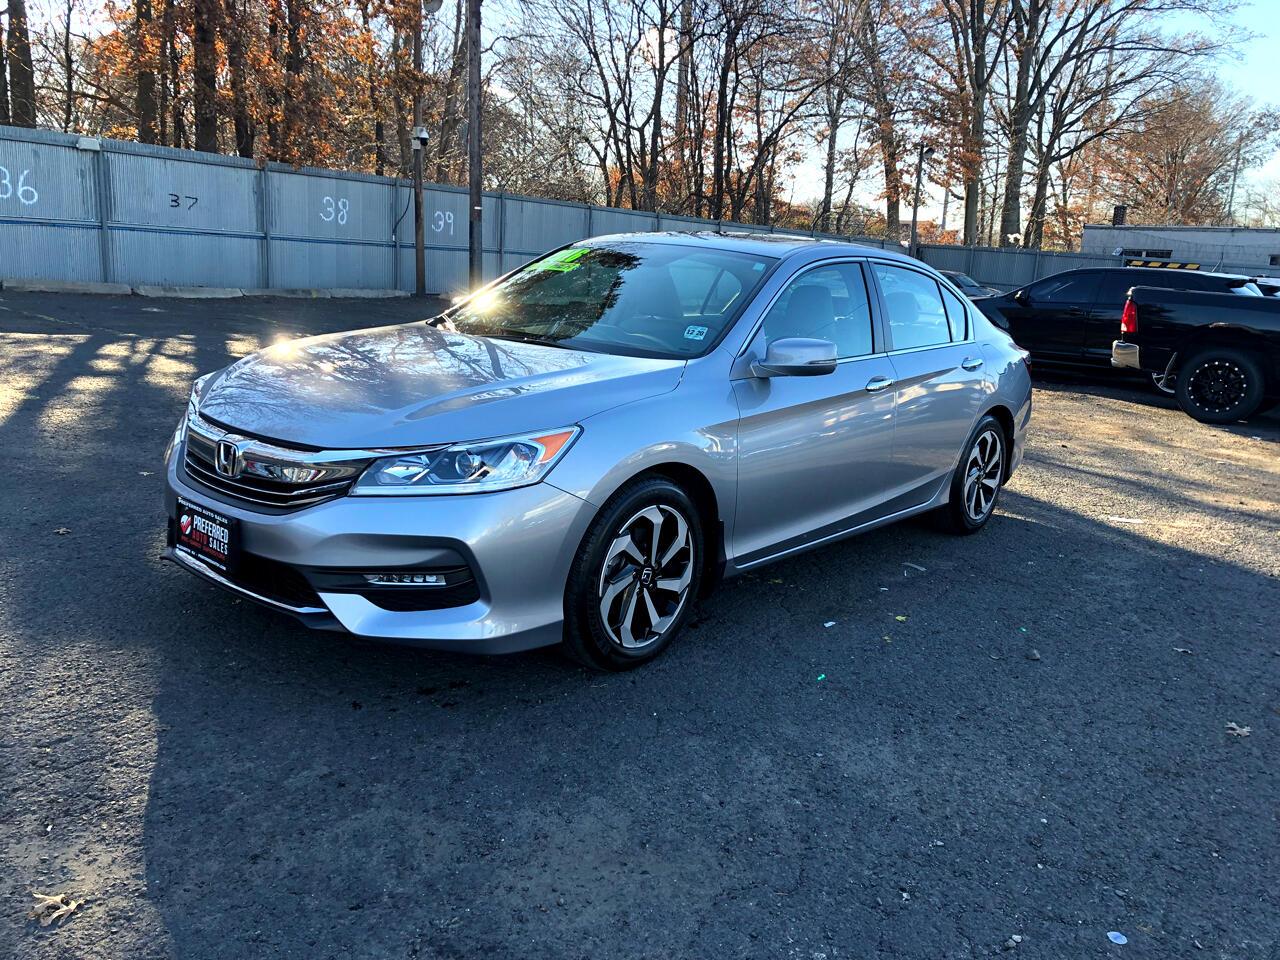 2016 Honda Accord EX-L Sedan with Navigation